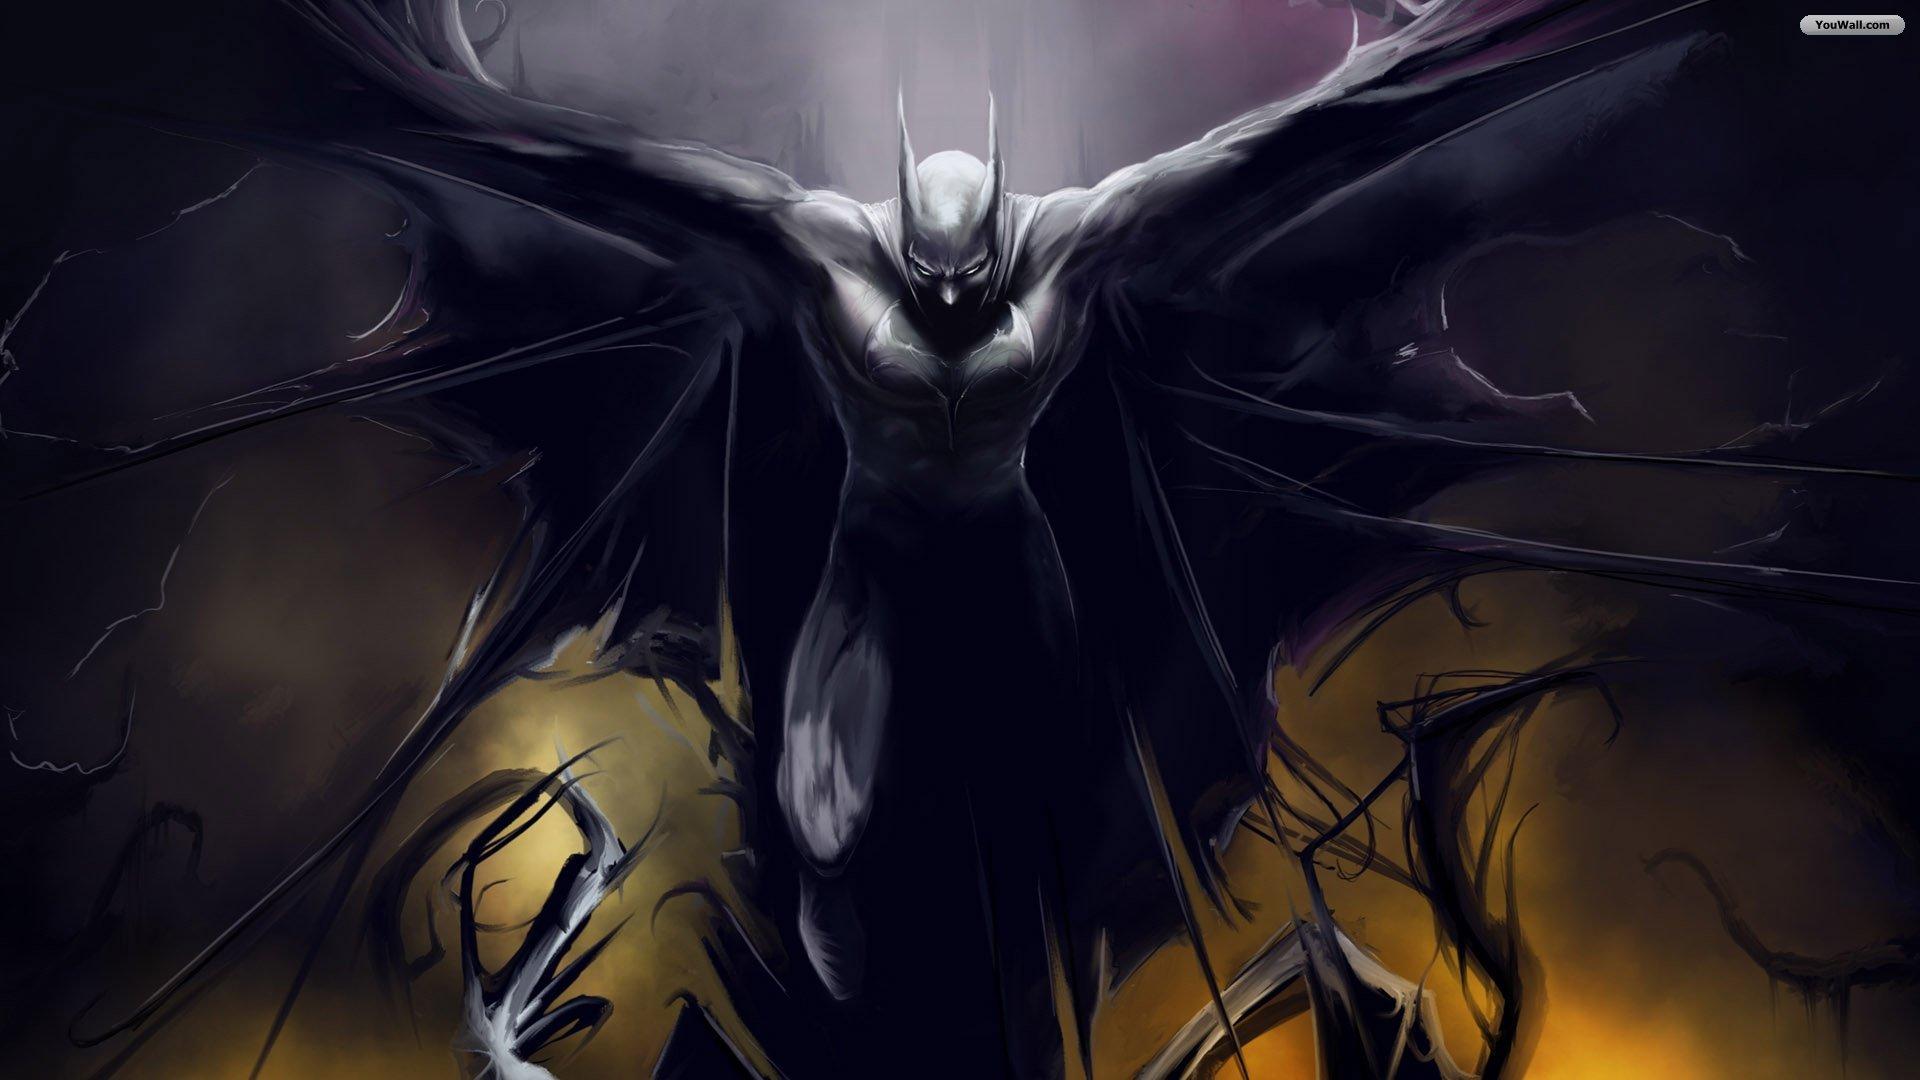 Batman desktop wallpapers Batman wallpapers 1920x1080